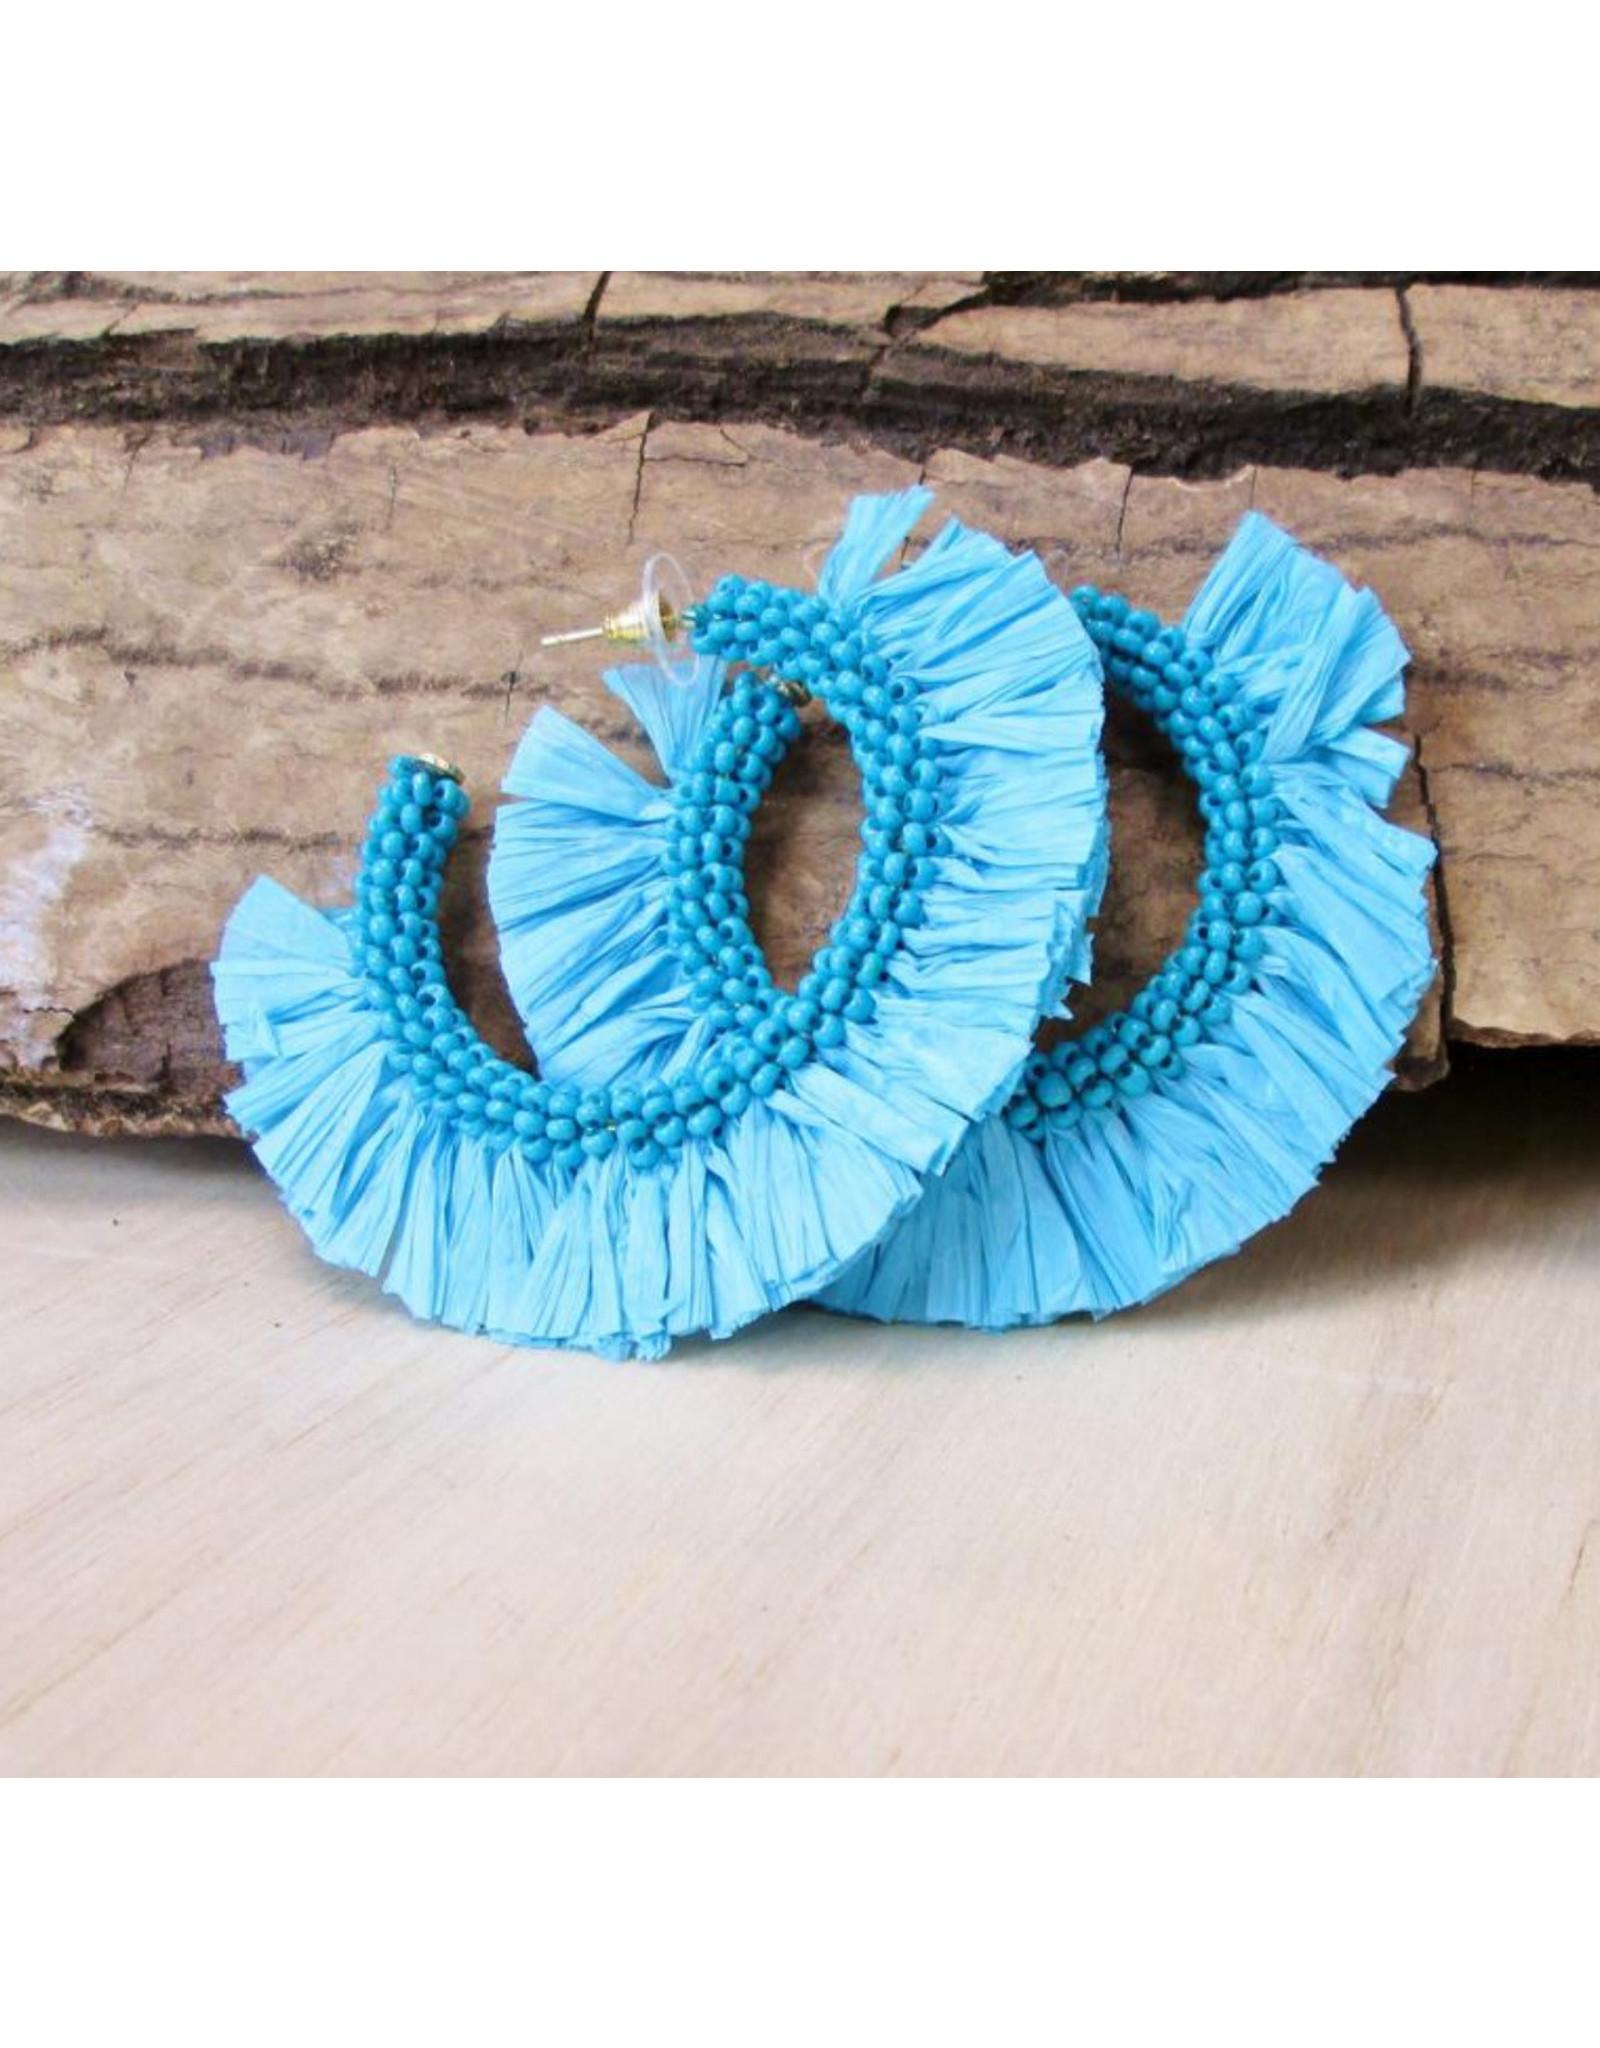 Bali Queen Turquoise Raffia Hoop Earrings